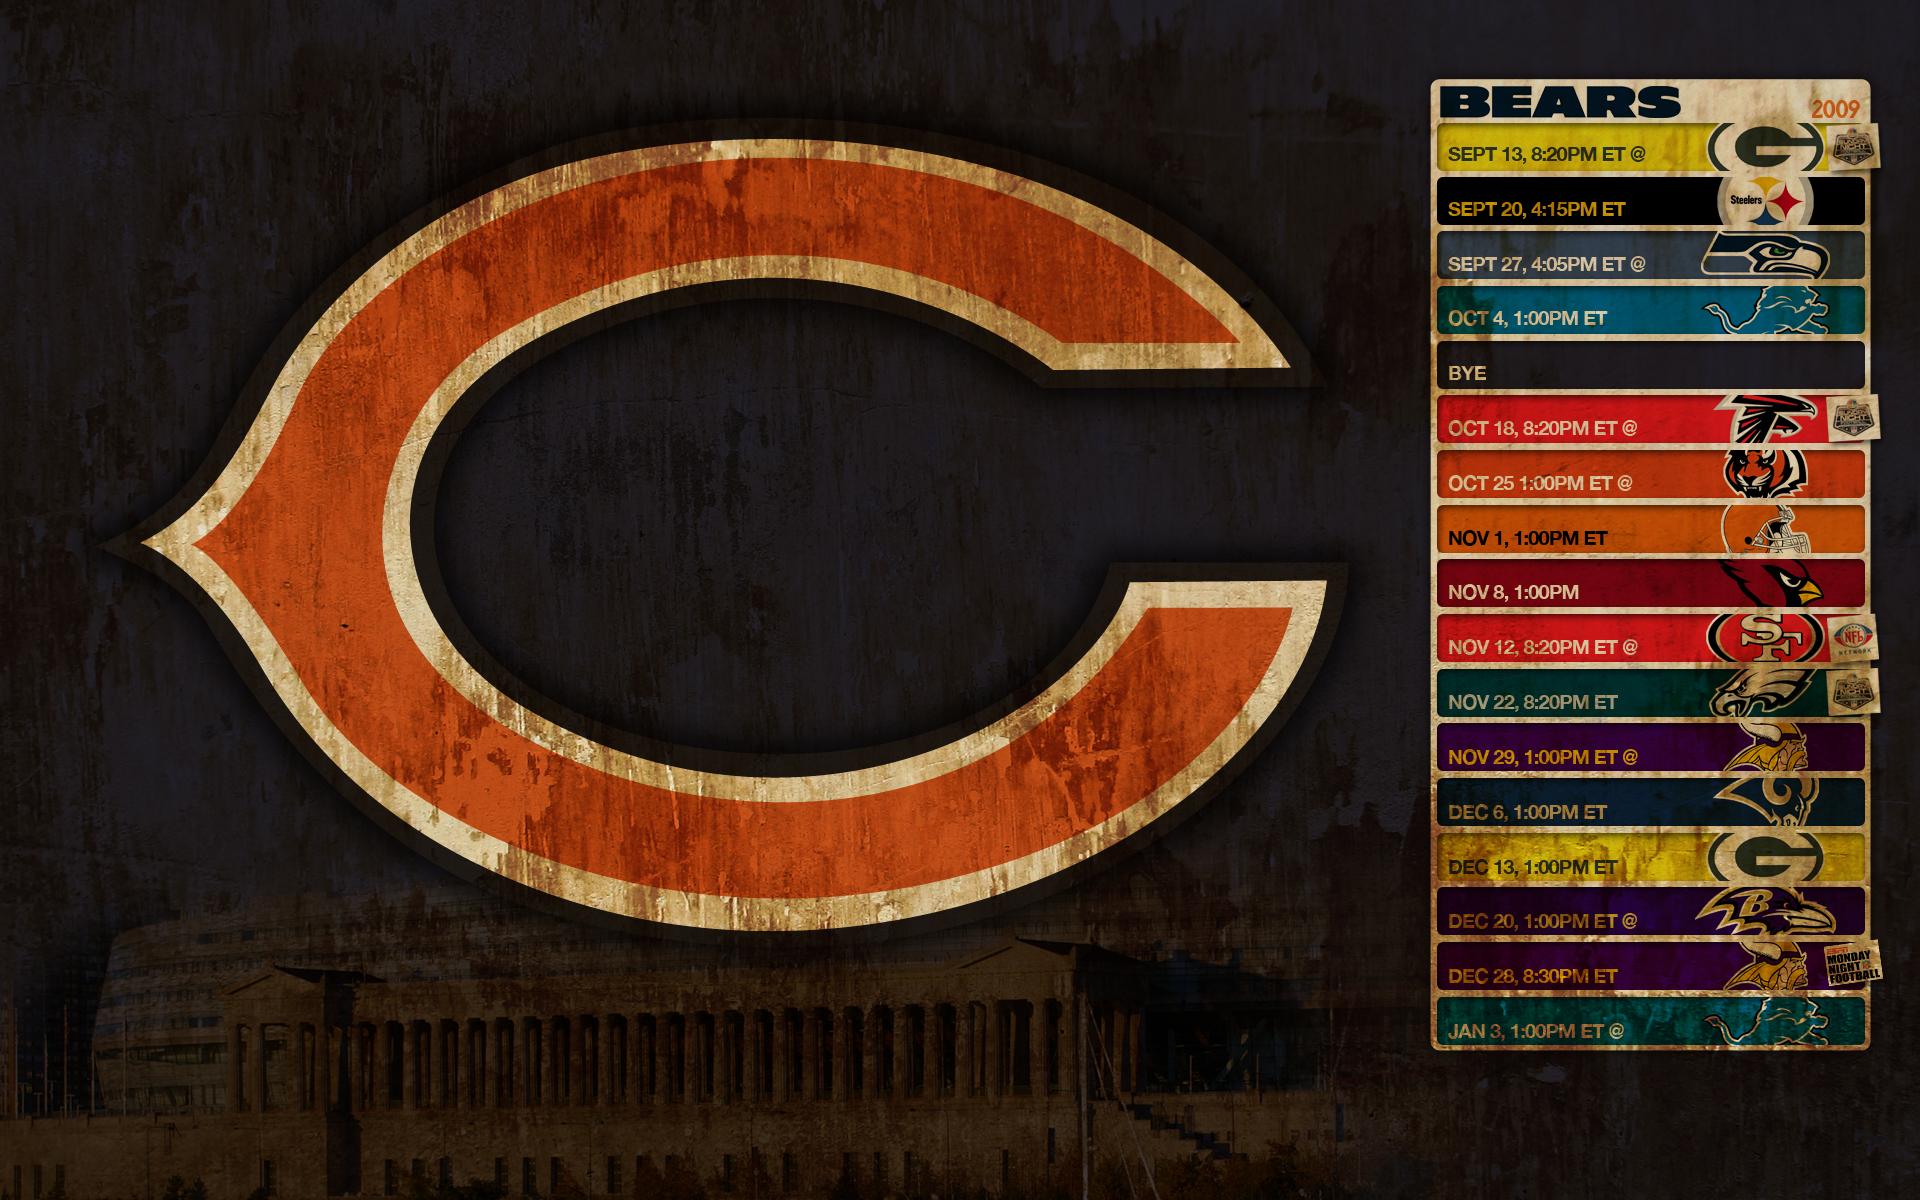 chicago bears schedule schedule 1920x1200